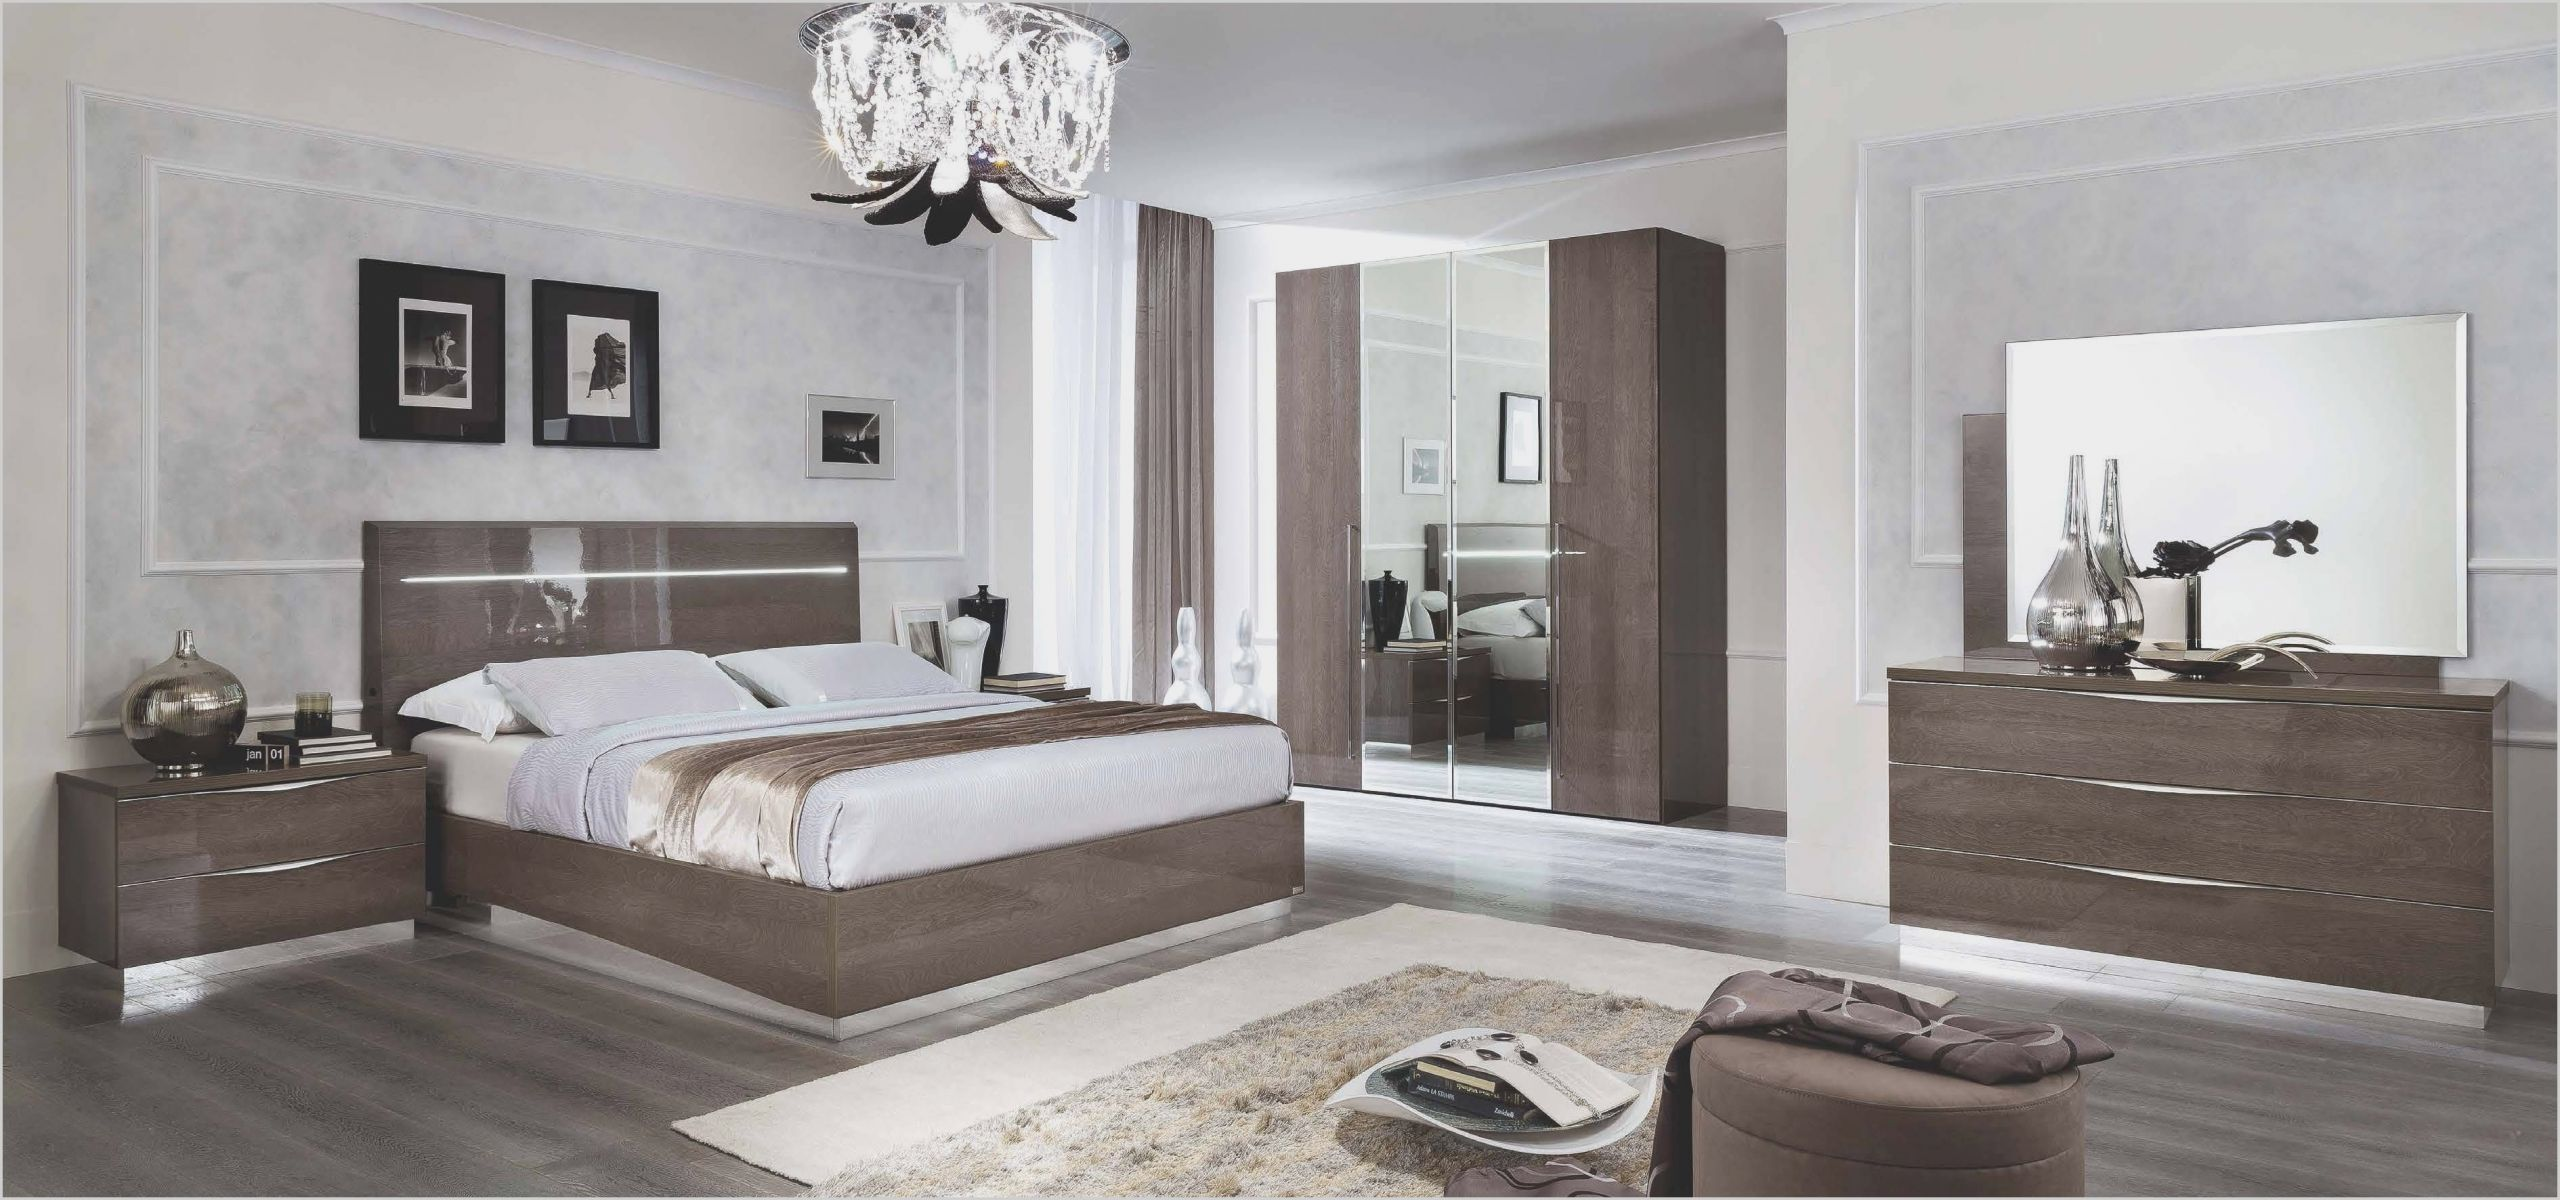 Modern Italian High Gloss Bedroom Furniture  Contemporary bedroom